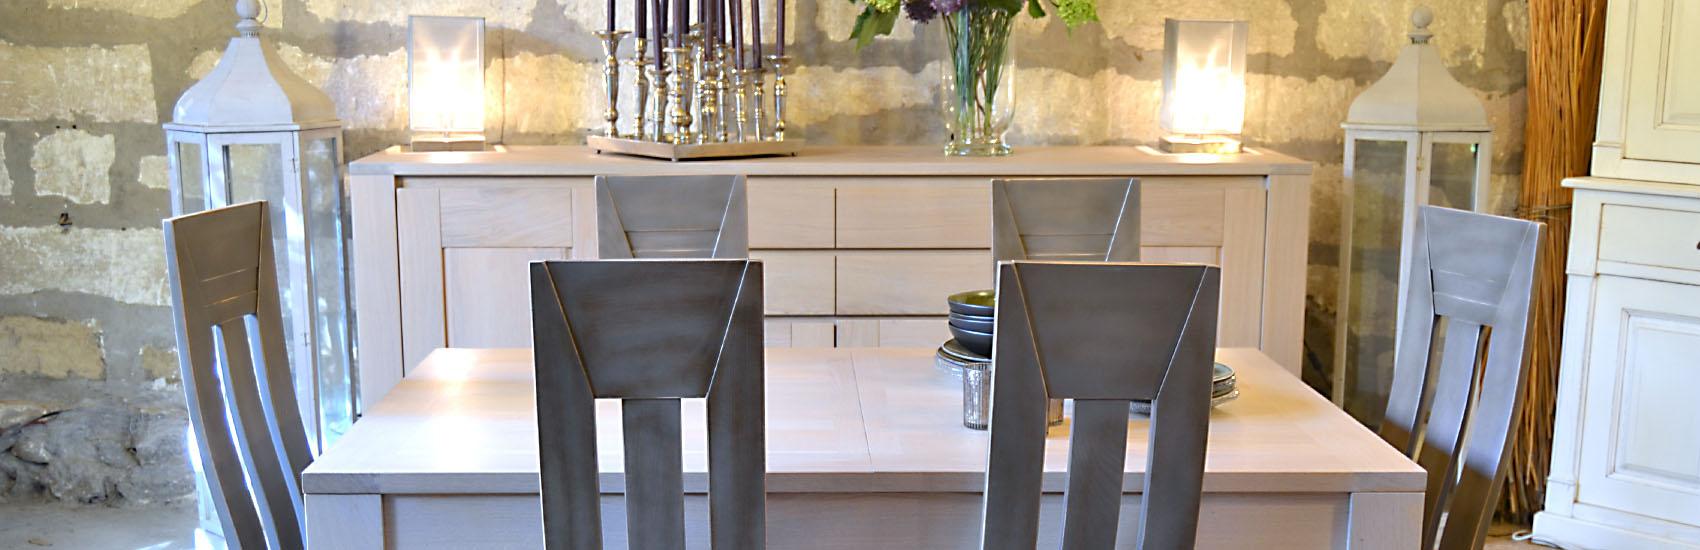 enfilade contemporaine emma lacroix b niste. Black Bedroom Furniture Sets. Home Design Ideas